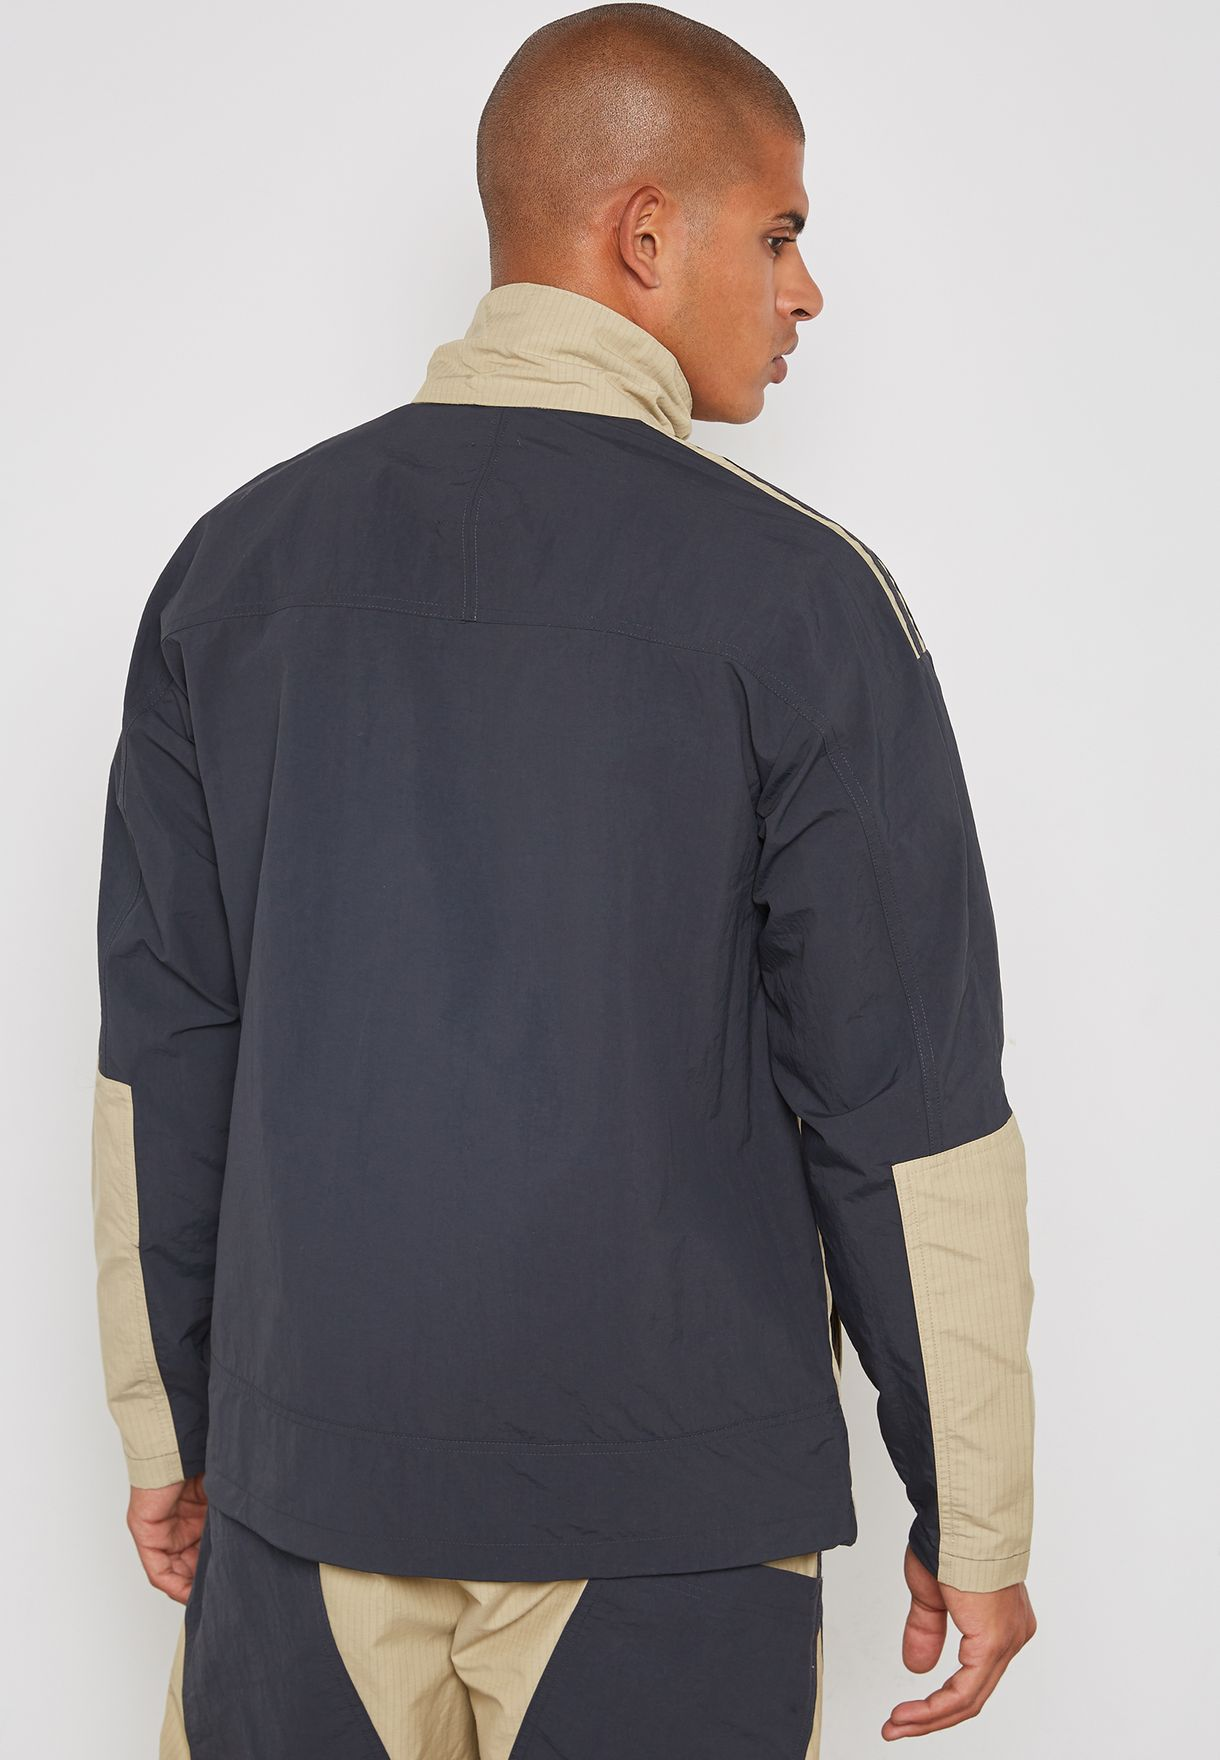 37a12c740 adidas Originals NMD Track Top - SPORTING GOODS Sports Jackets ...